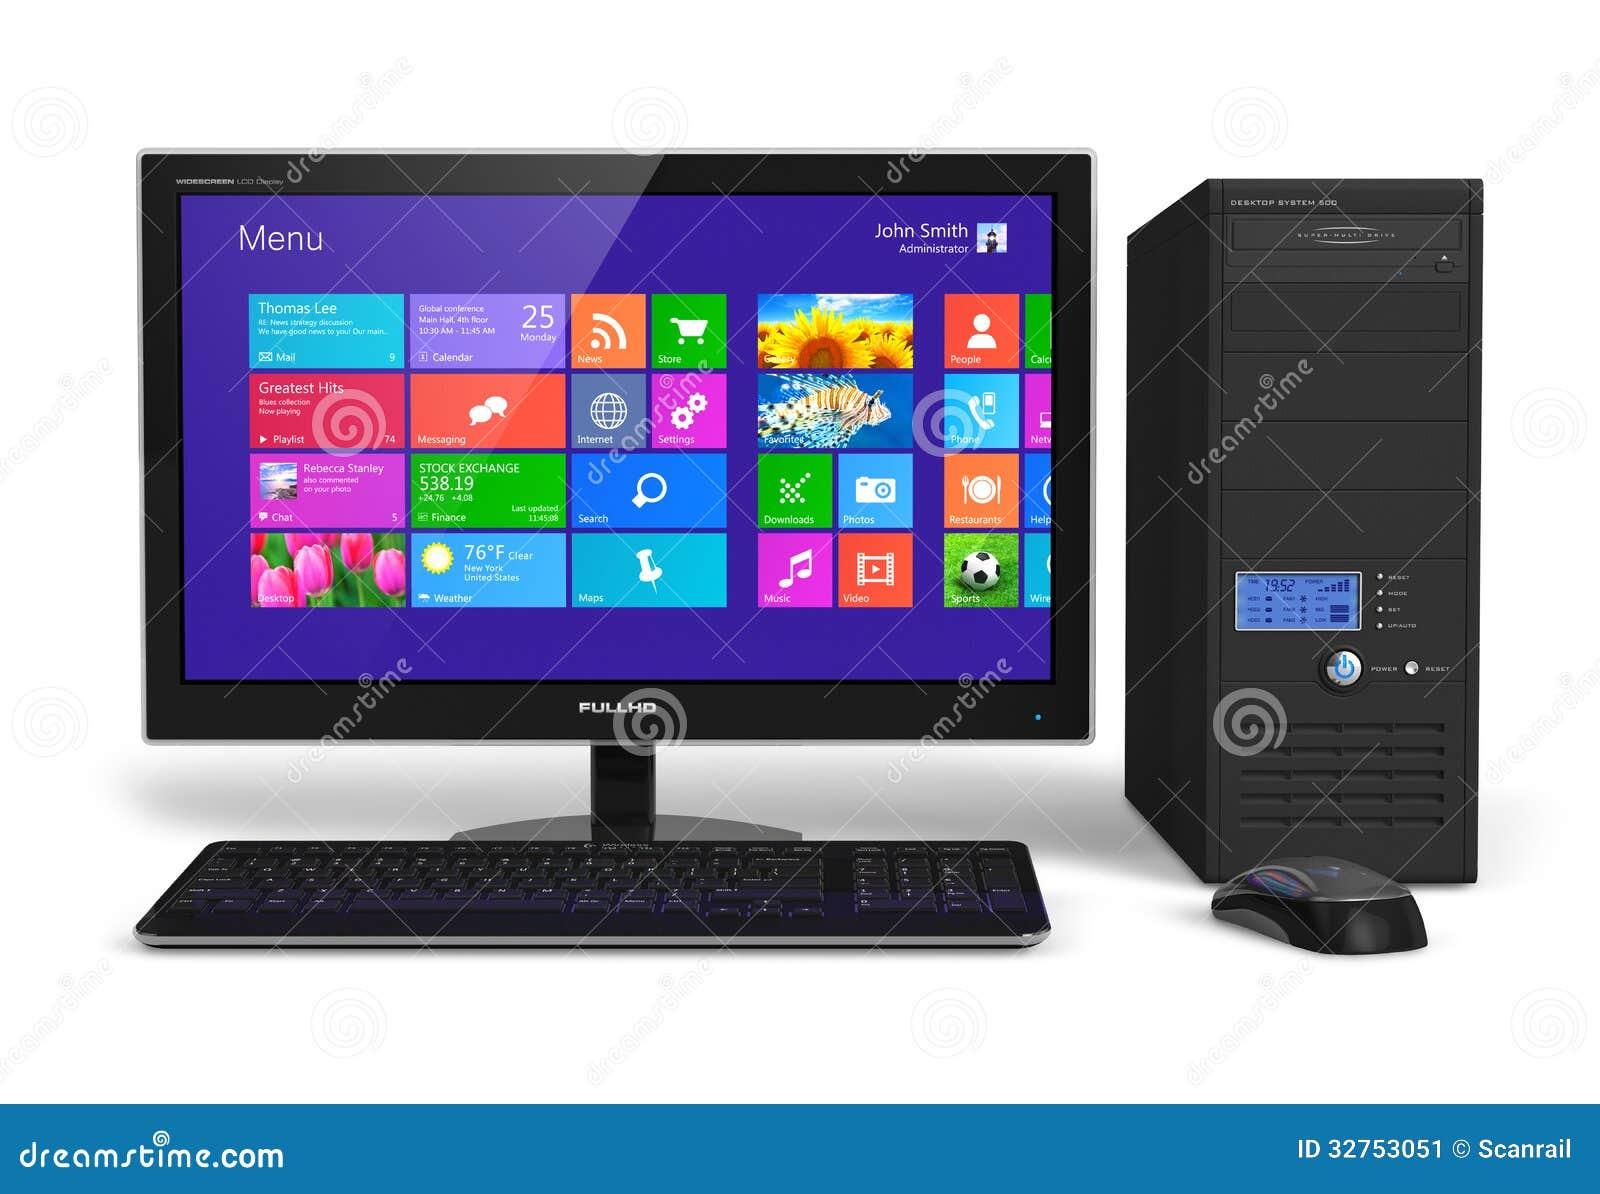 ordinateur de bureau avec l 39 interface d 39 cran tactile. Black Bedroom Furniture Sets. Home Design Ideas